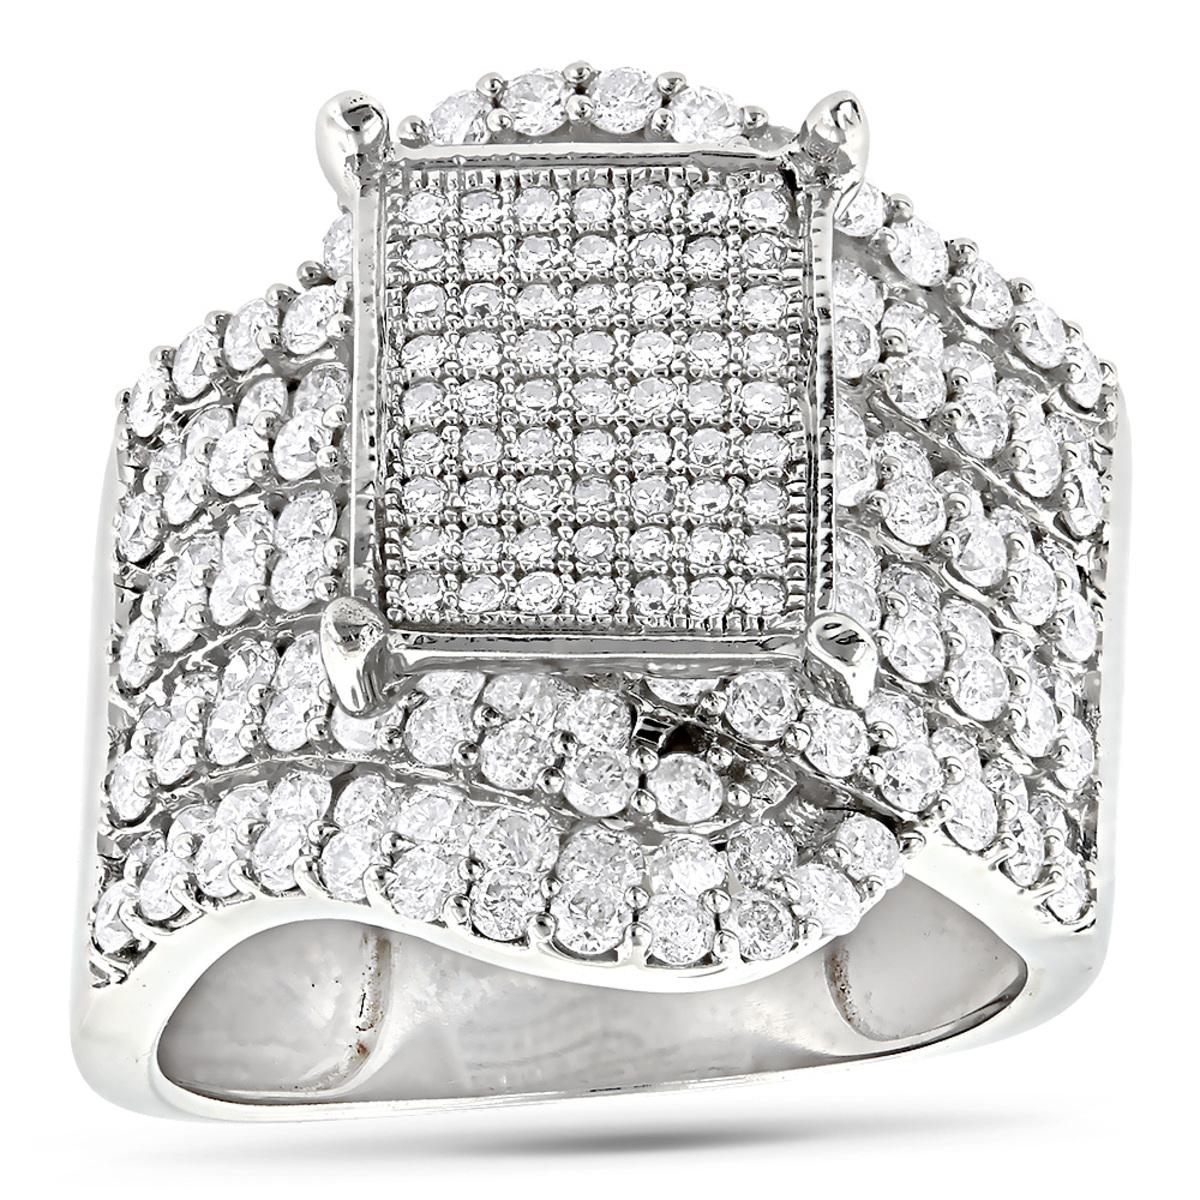 Ladies Diamond Engagement Ring 14K 2.69ct